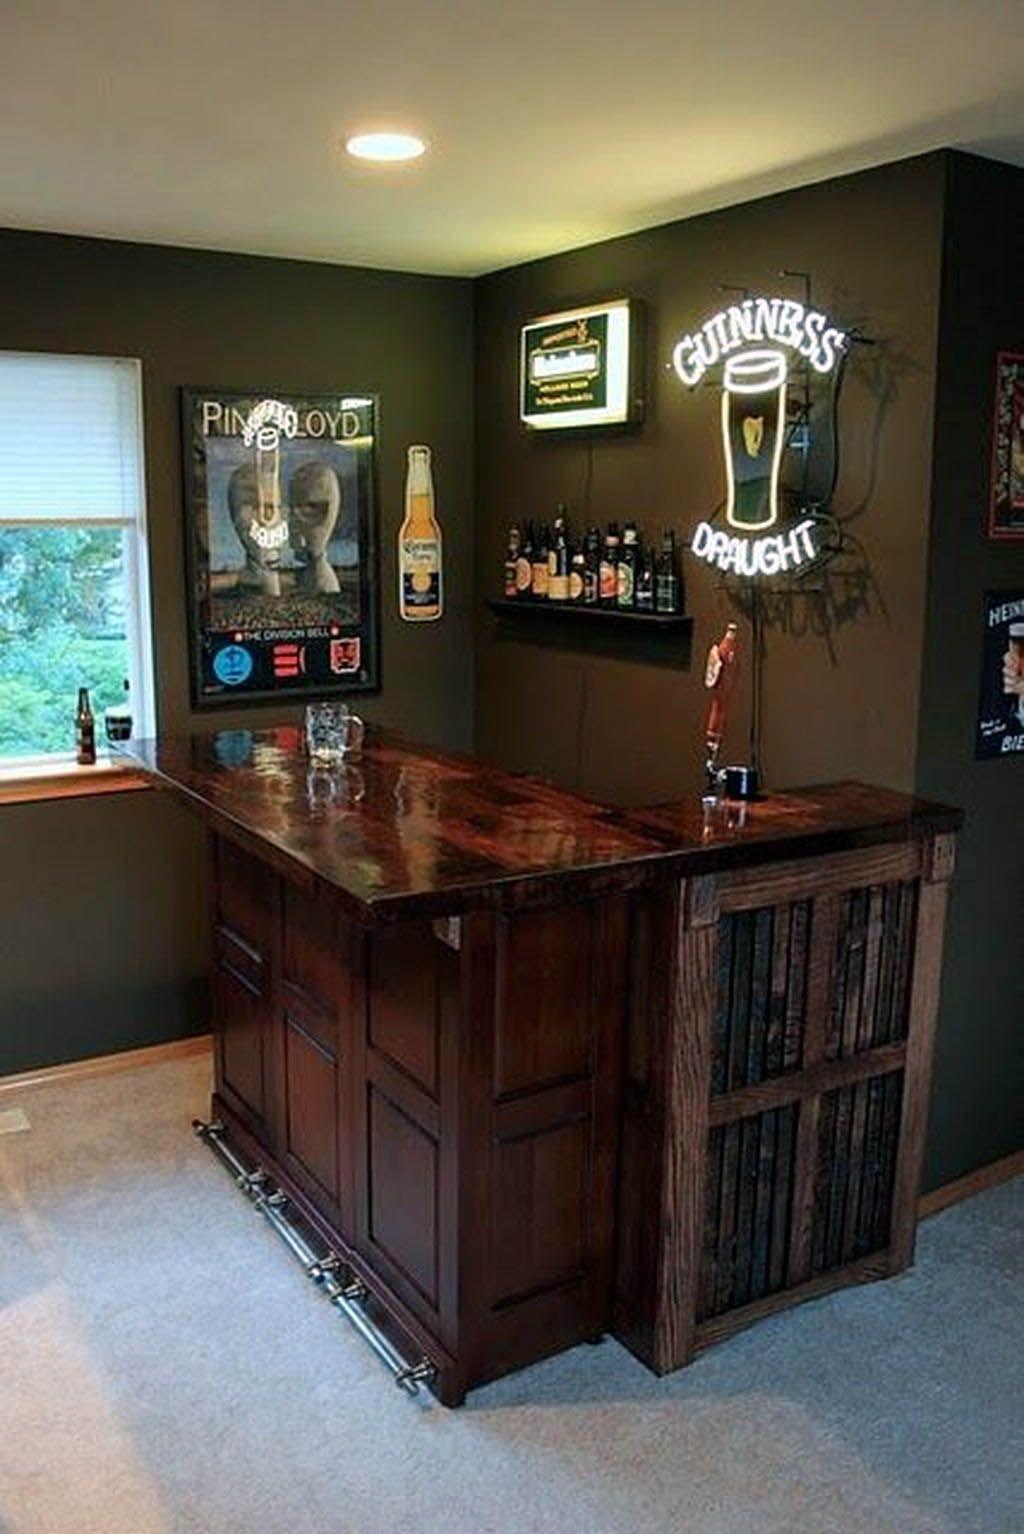 Impressive Basement Jazz Bar Sydney On This Favorite Site Home Bar Rooms Diy Home Bar Home Bar Decor